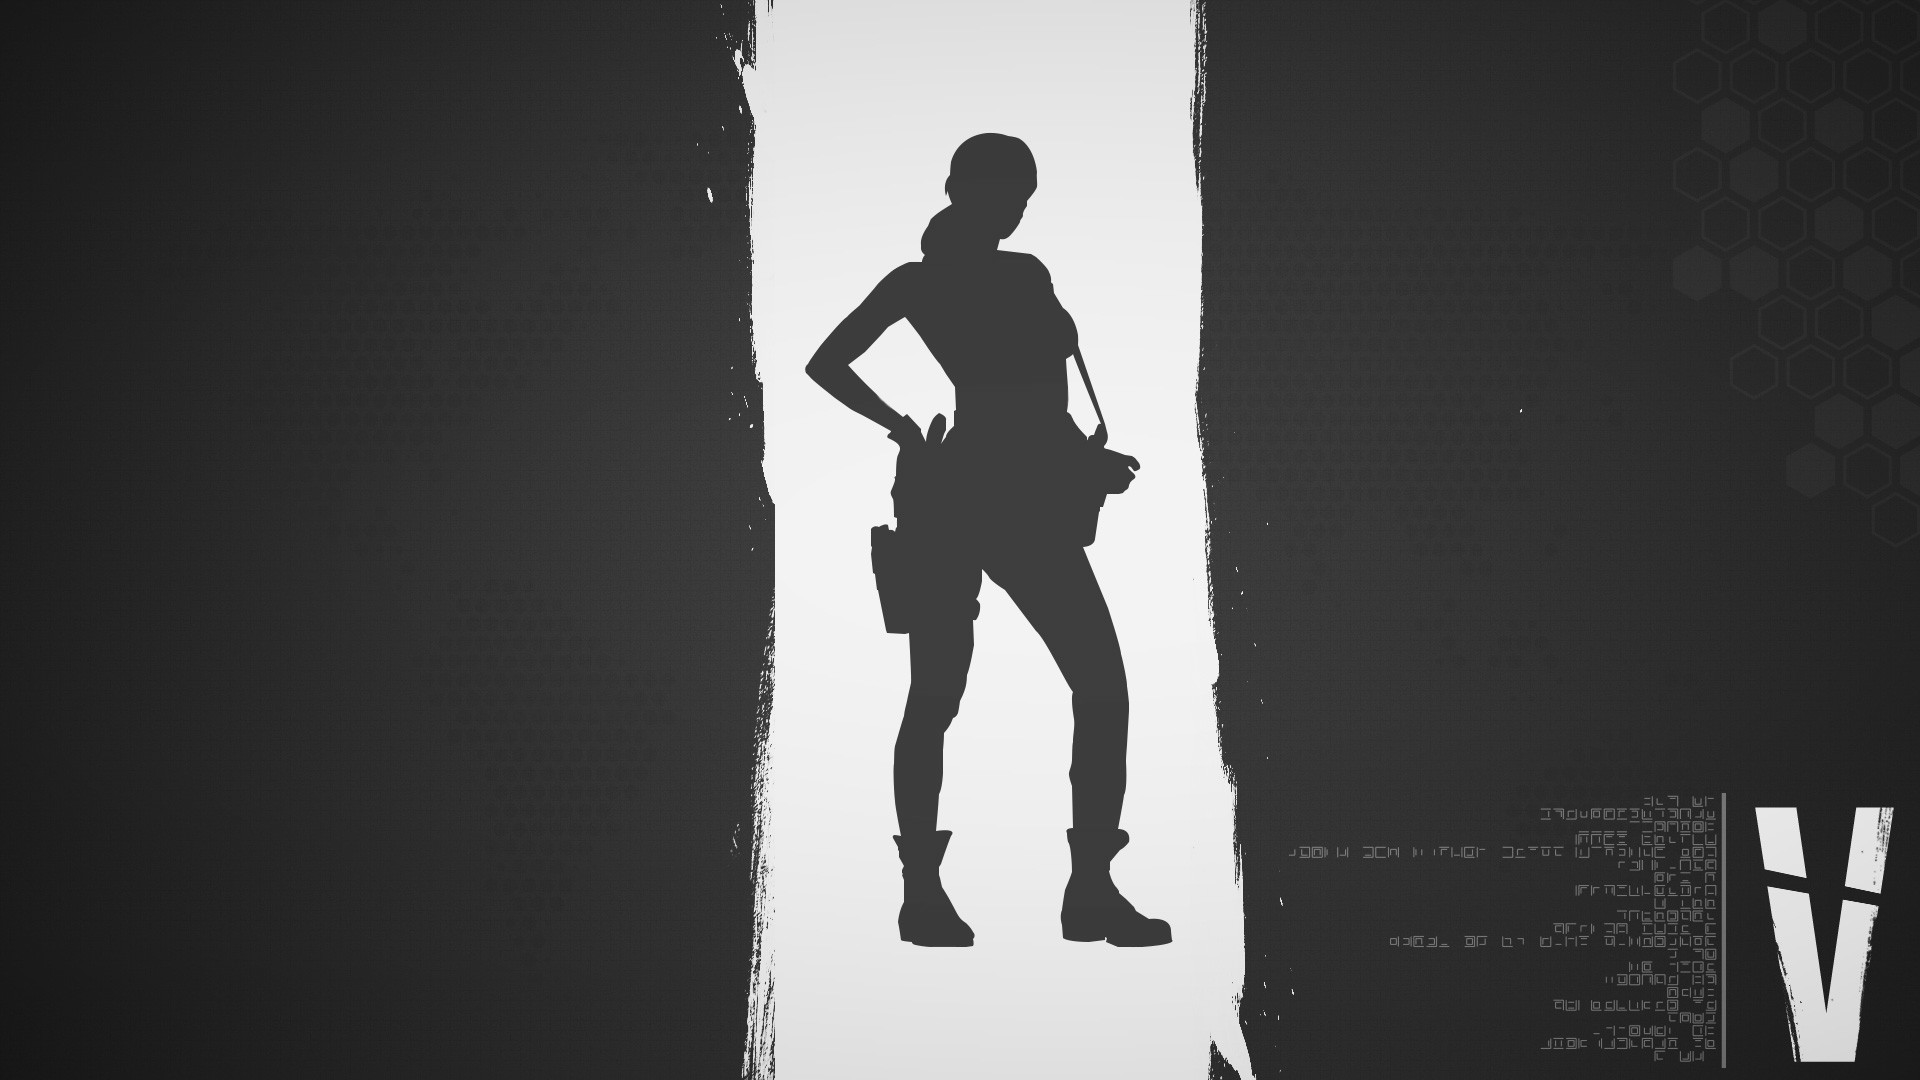 Metal Gear Solid 5 Quiet Wallpaper Gray